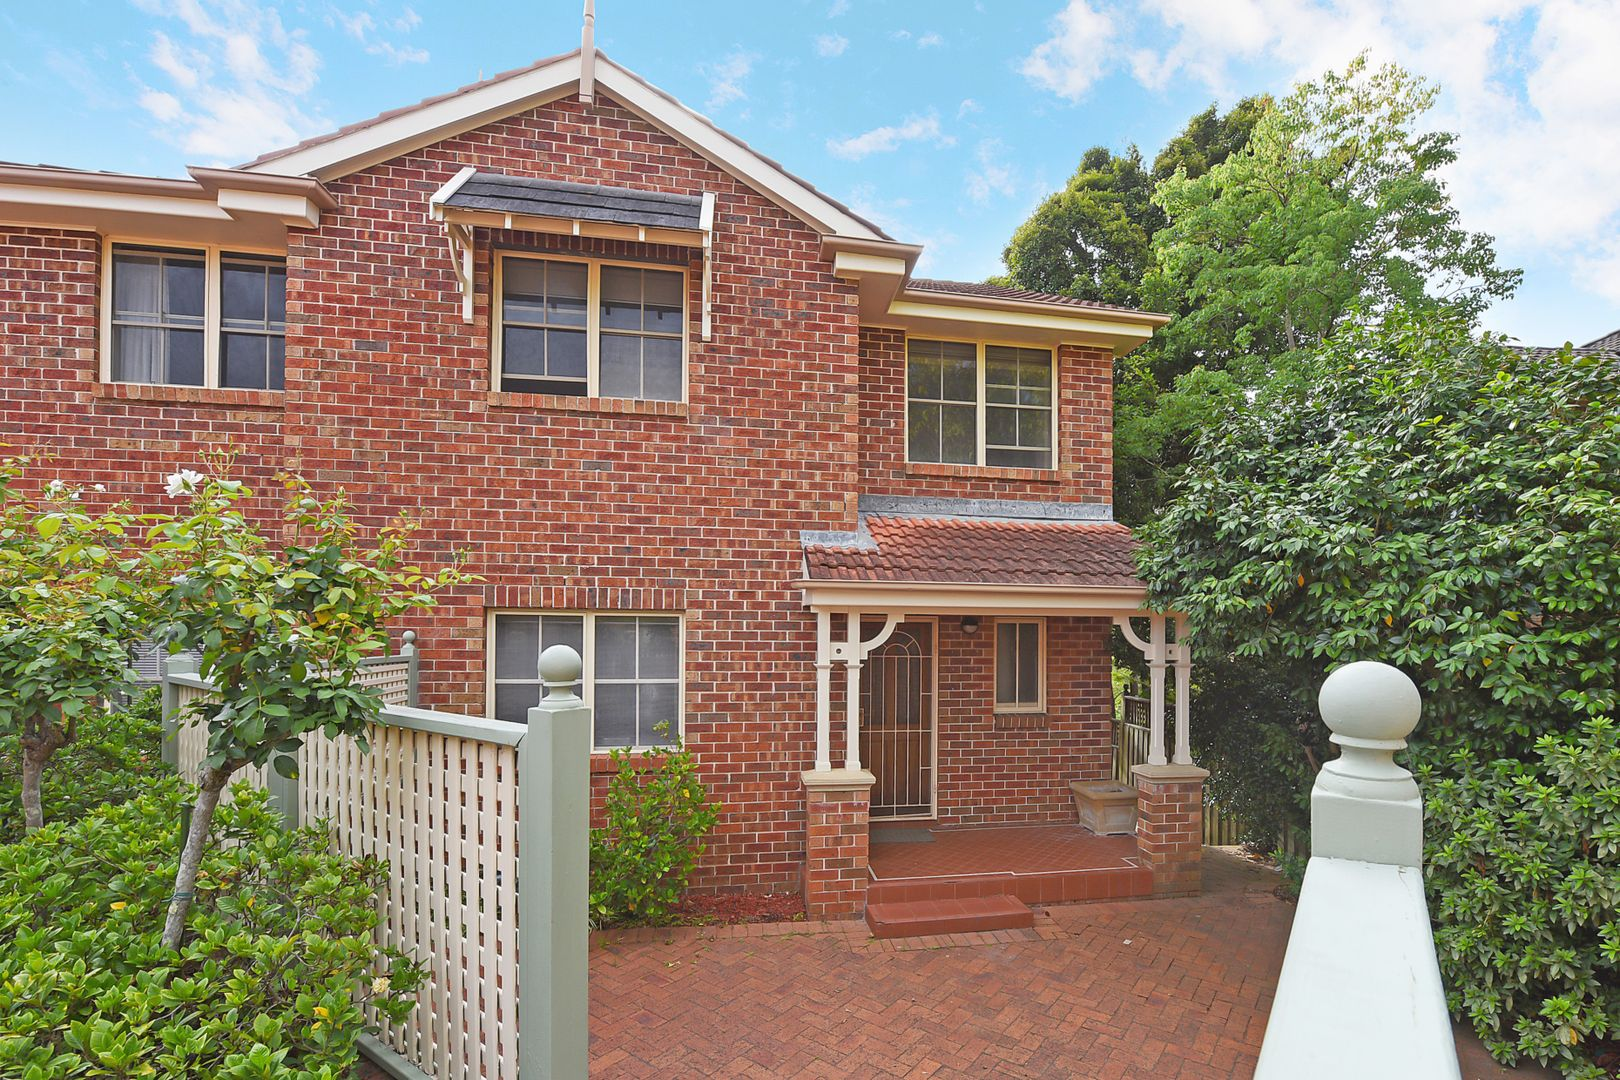 45/183 St Johns Avenue, Gordon NSW 2072, Image 0